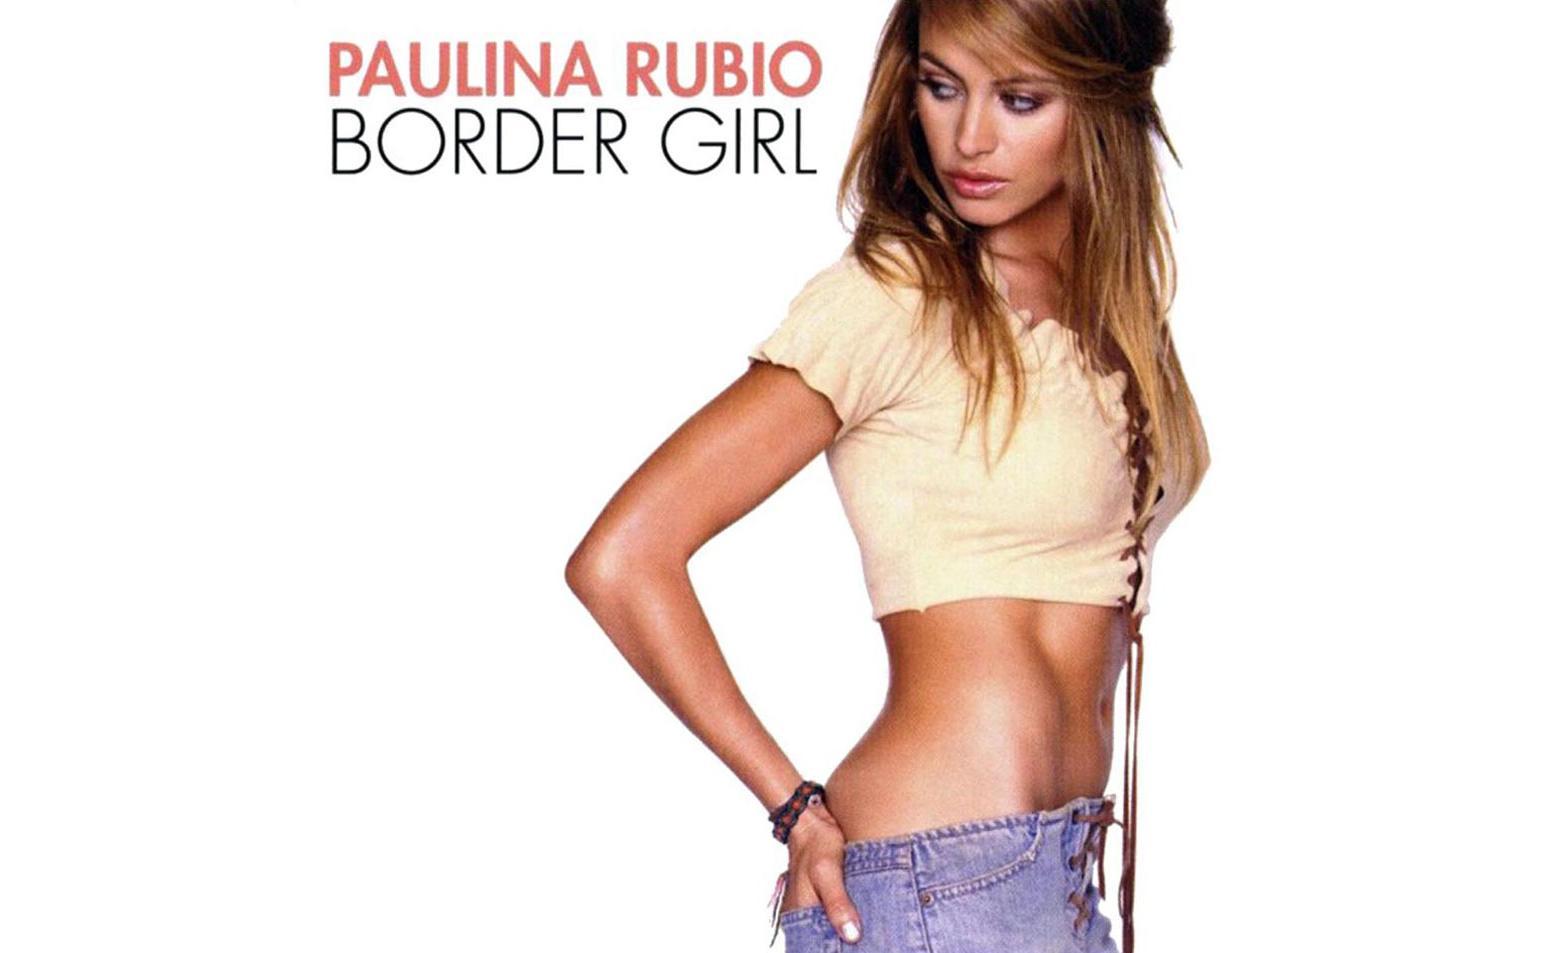 Paulina Rubio Border Girl